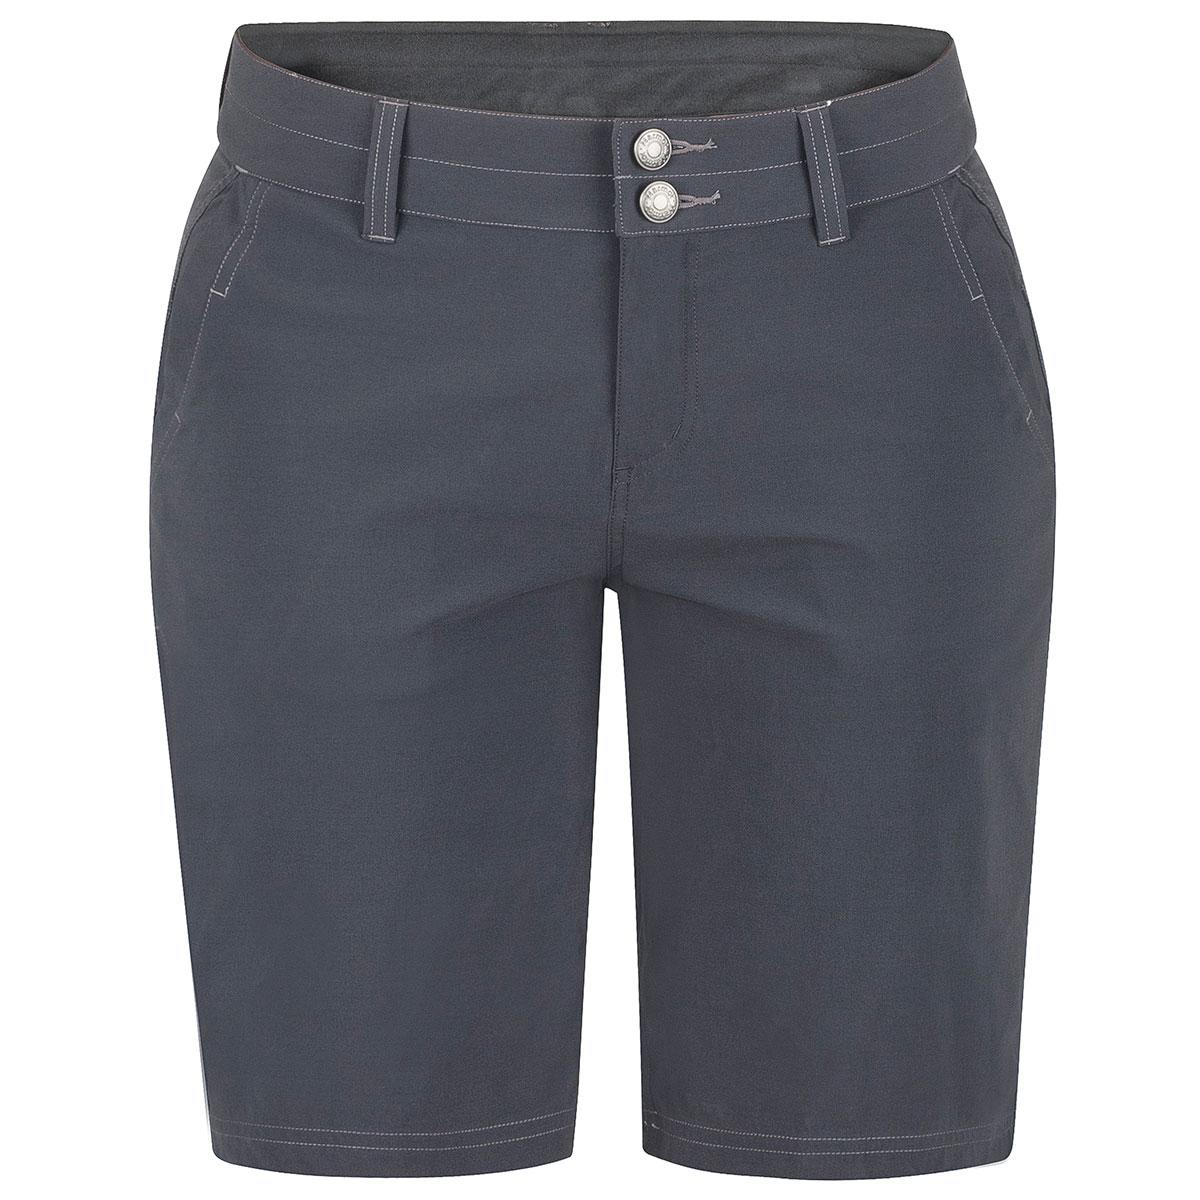 Marmot Women's Kodachrome Shorts - Black, 12